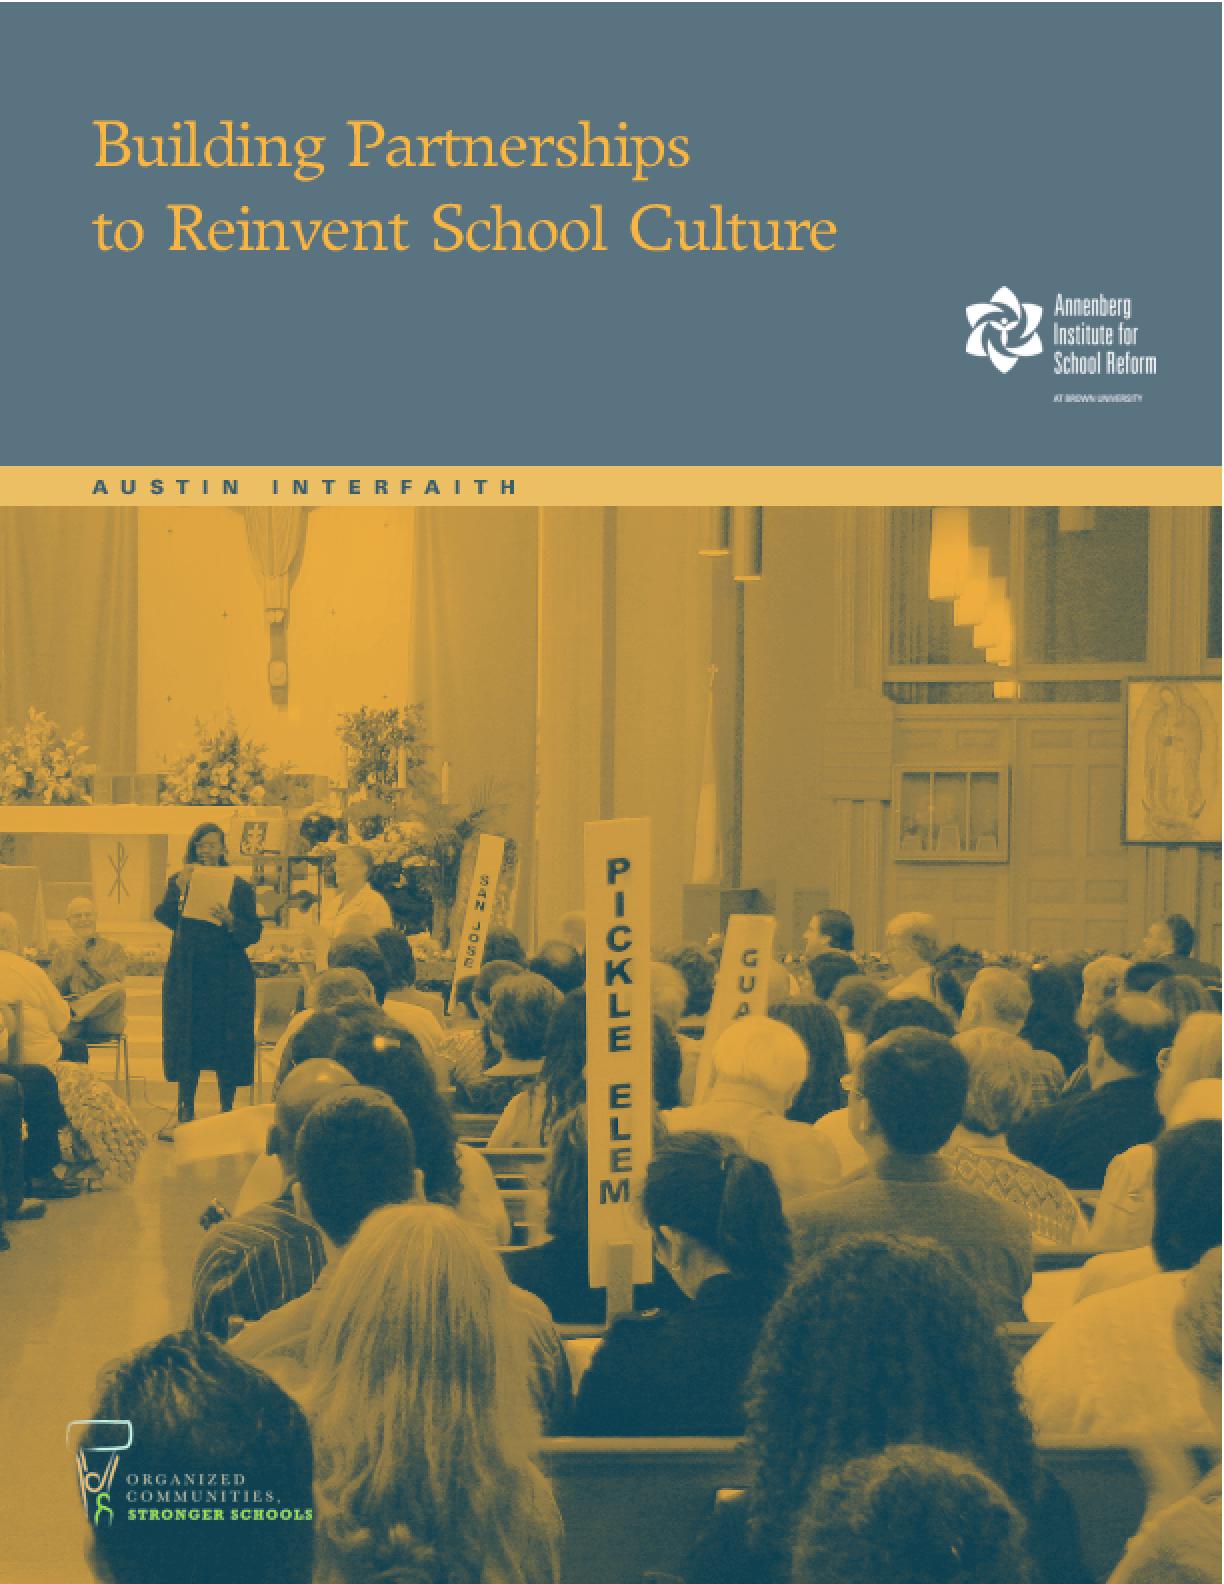 Building Partnerships to Reinvent School Culture